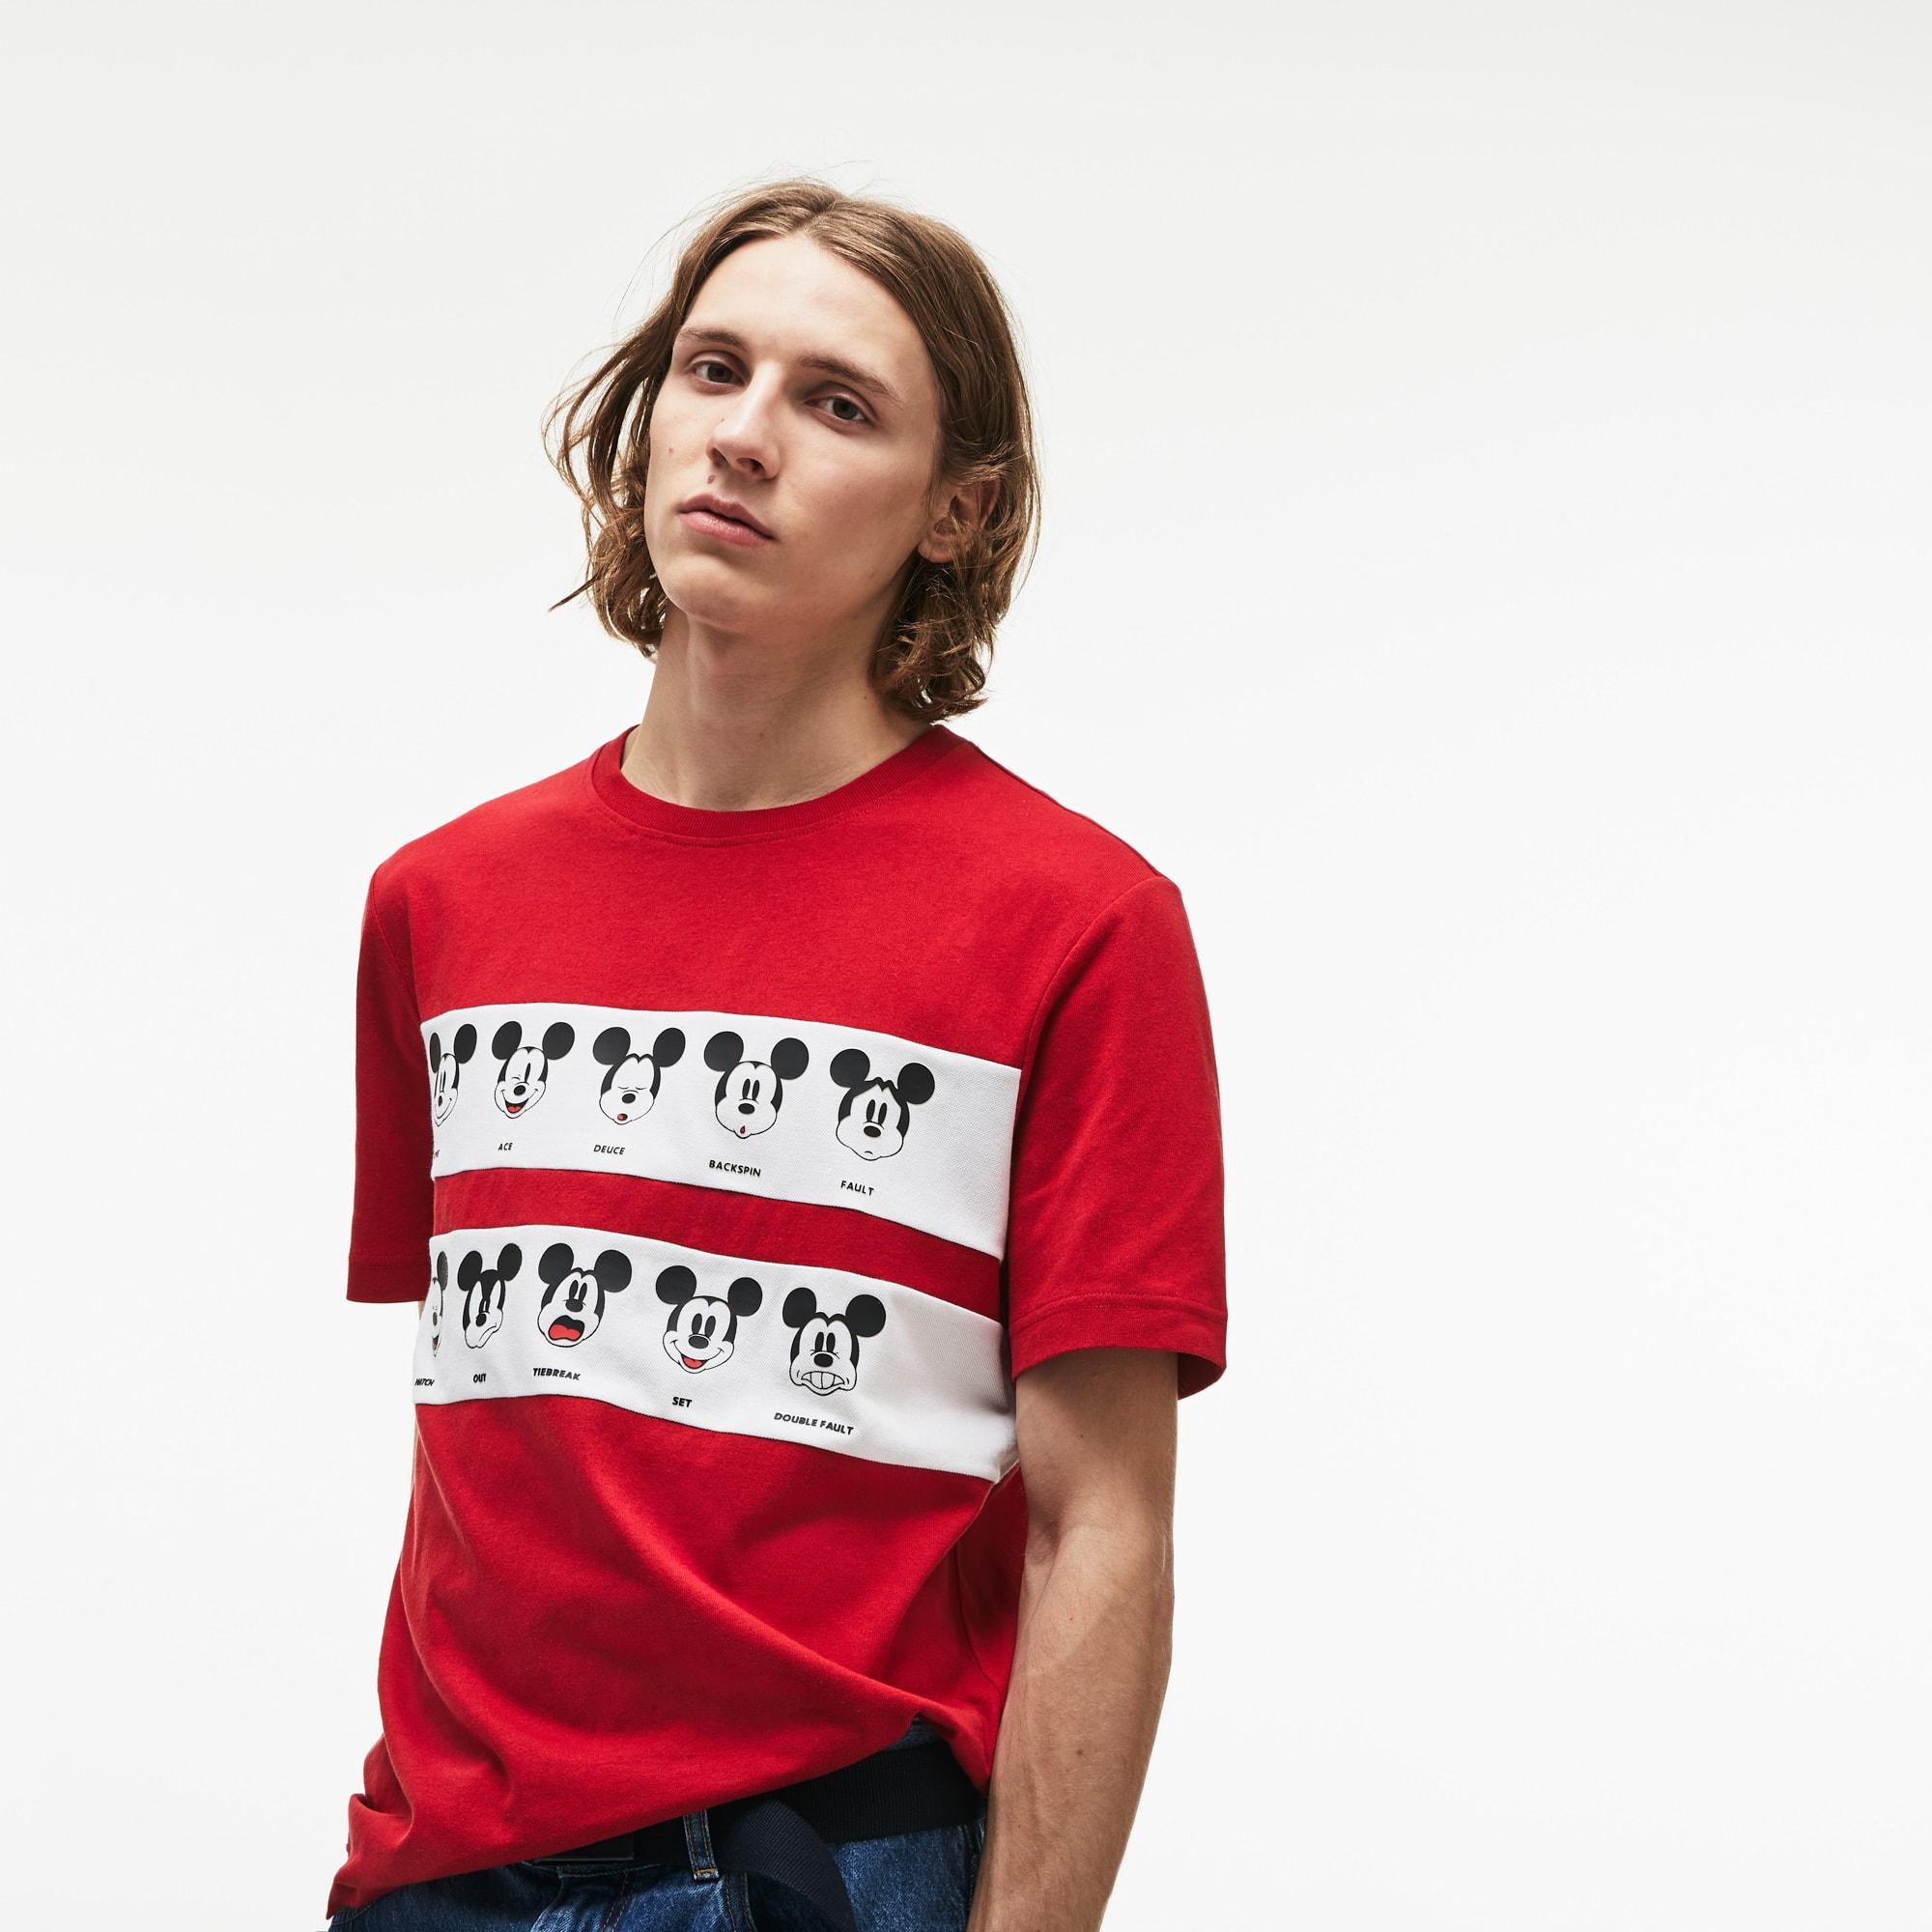 T Sale Sale Sale Sale Shirts T Herren Lacoste Shirts Herren Shirts Lacoste Lacoste Shirts Herren T T Herren fqq0xnw7